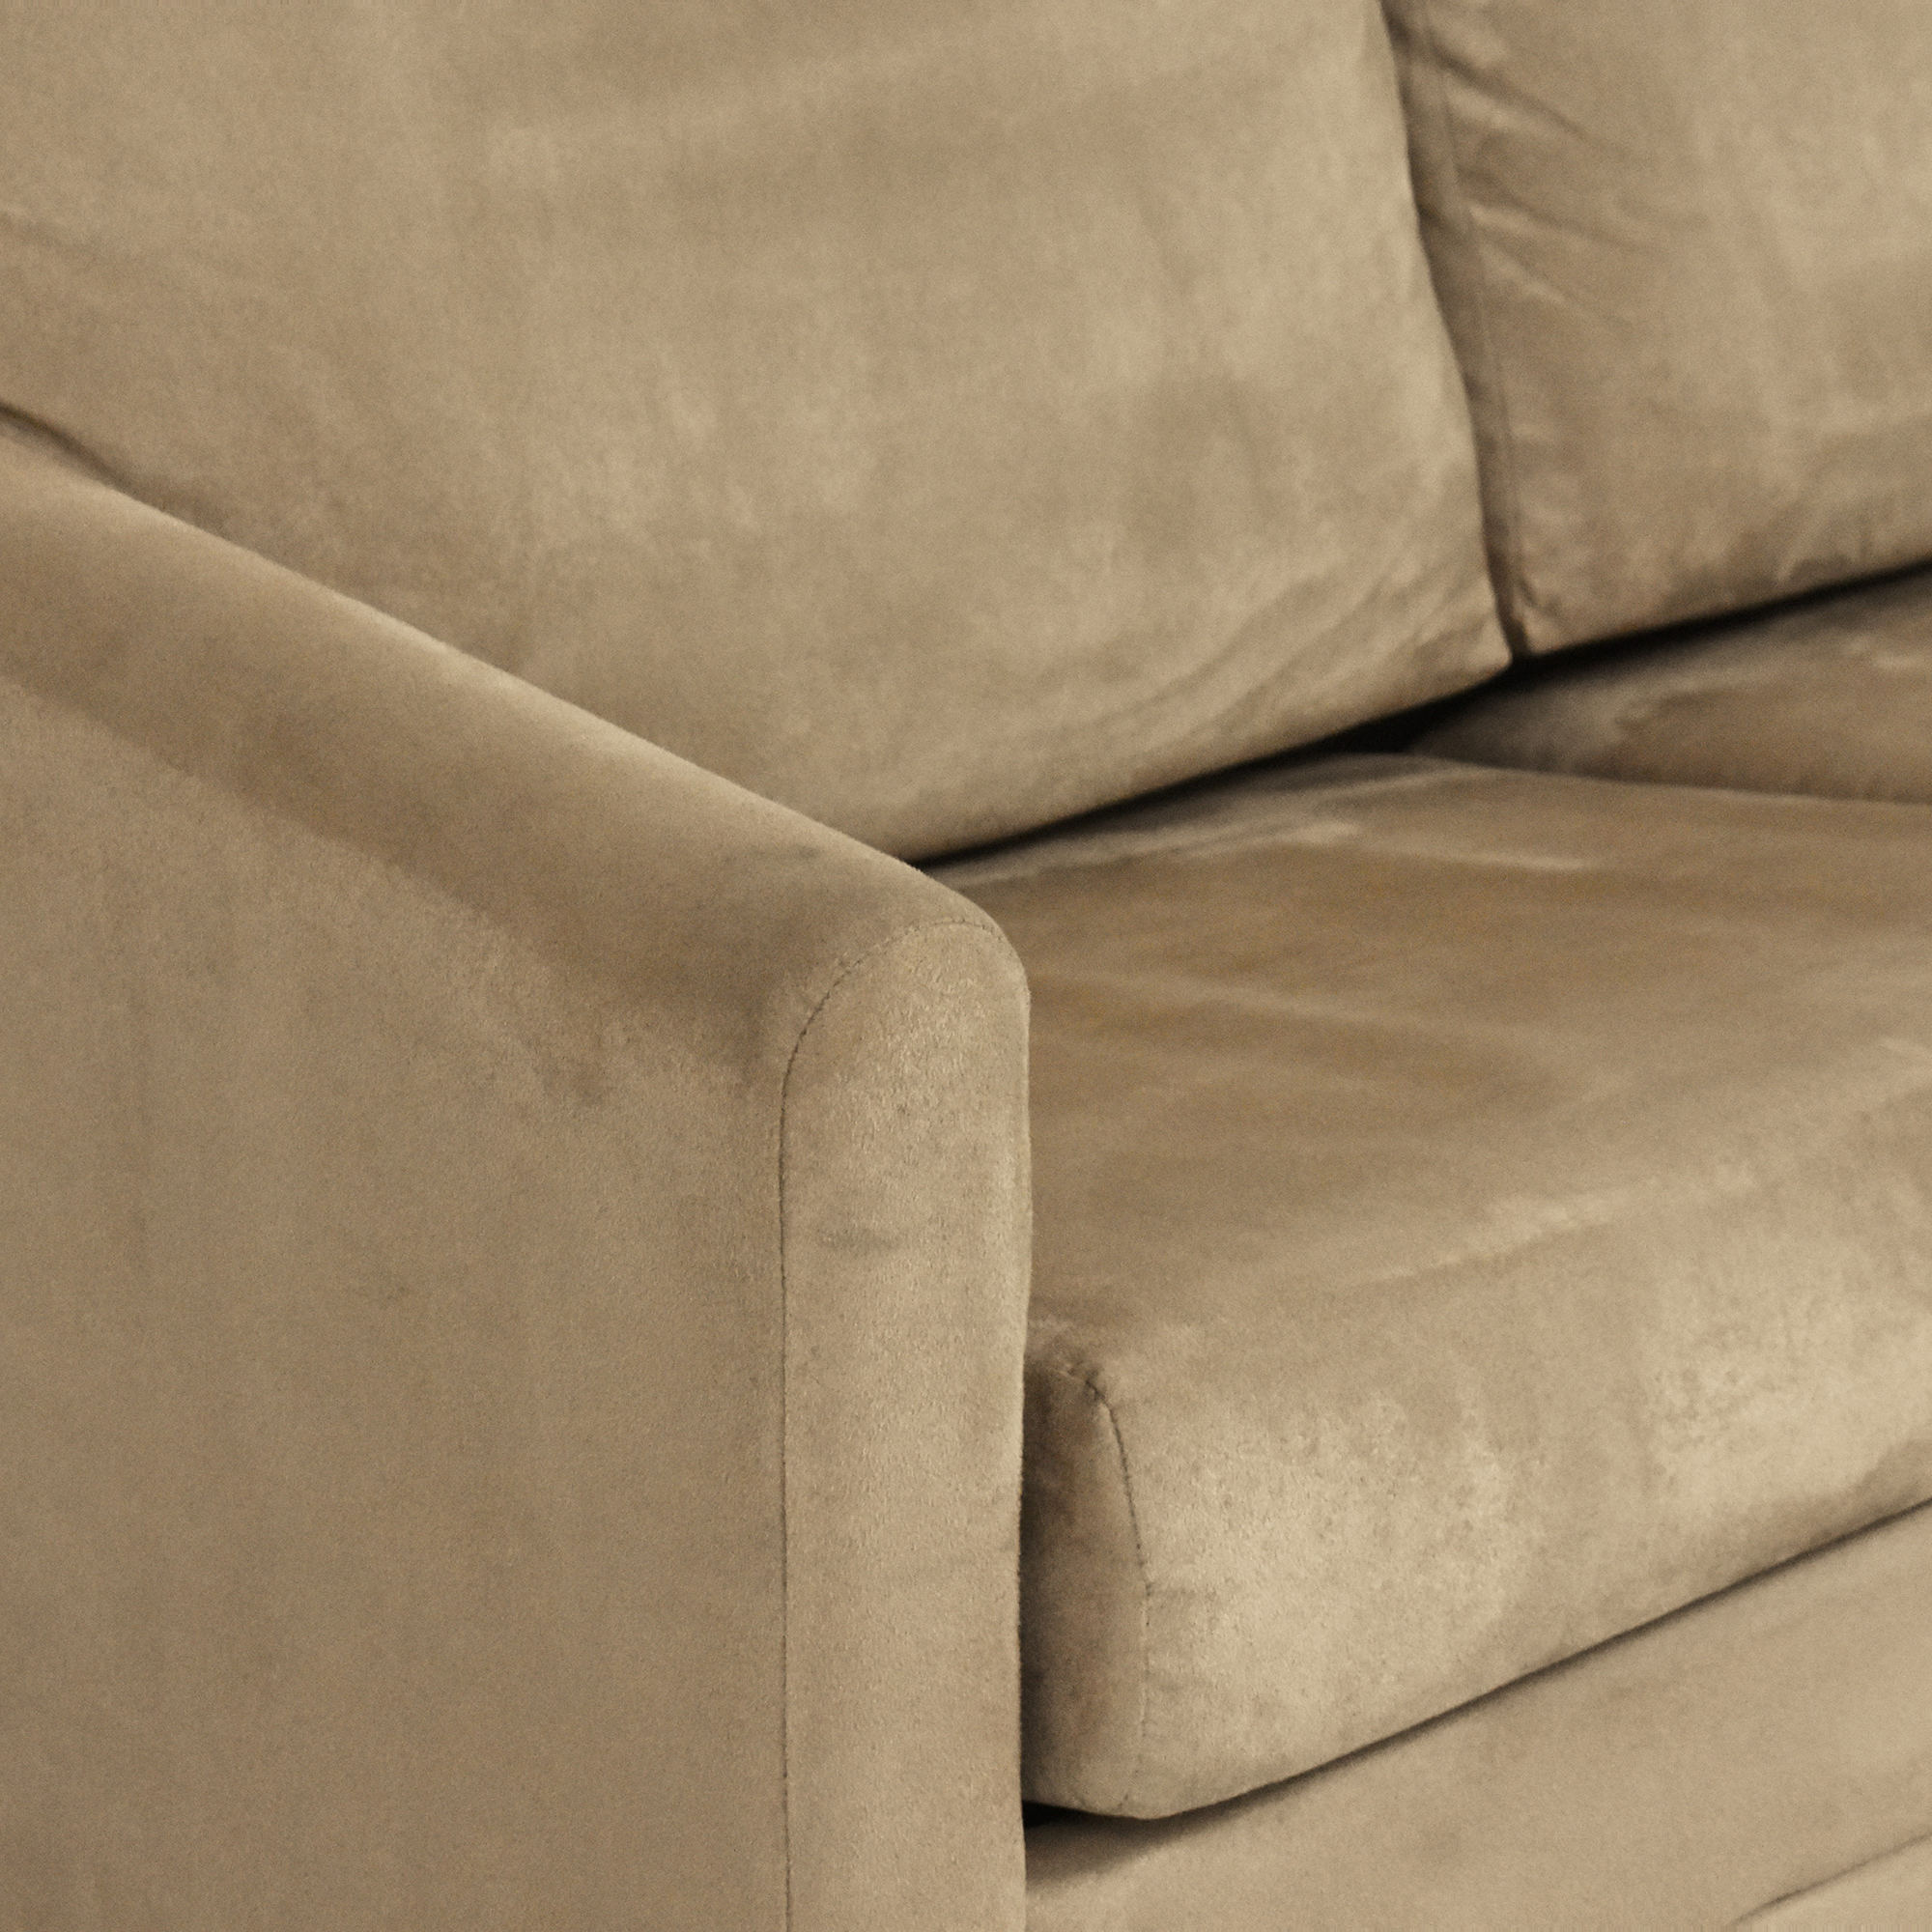 LaCrosse Furniture Lacrosse Furniture Two Cushion Sleeper Loveseat coupon